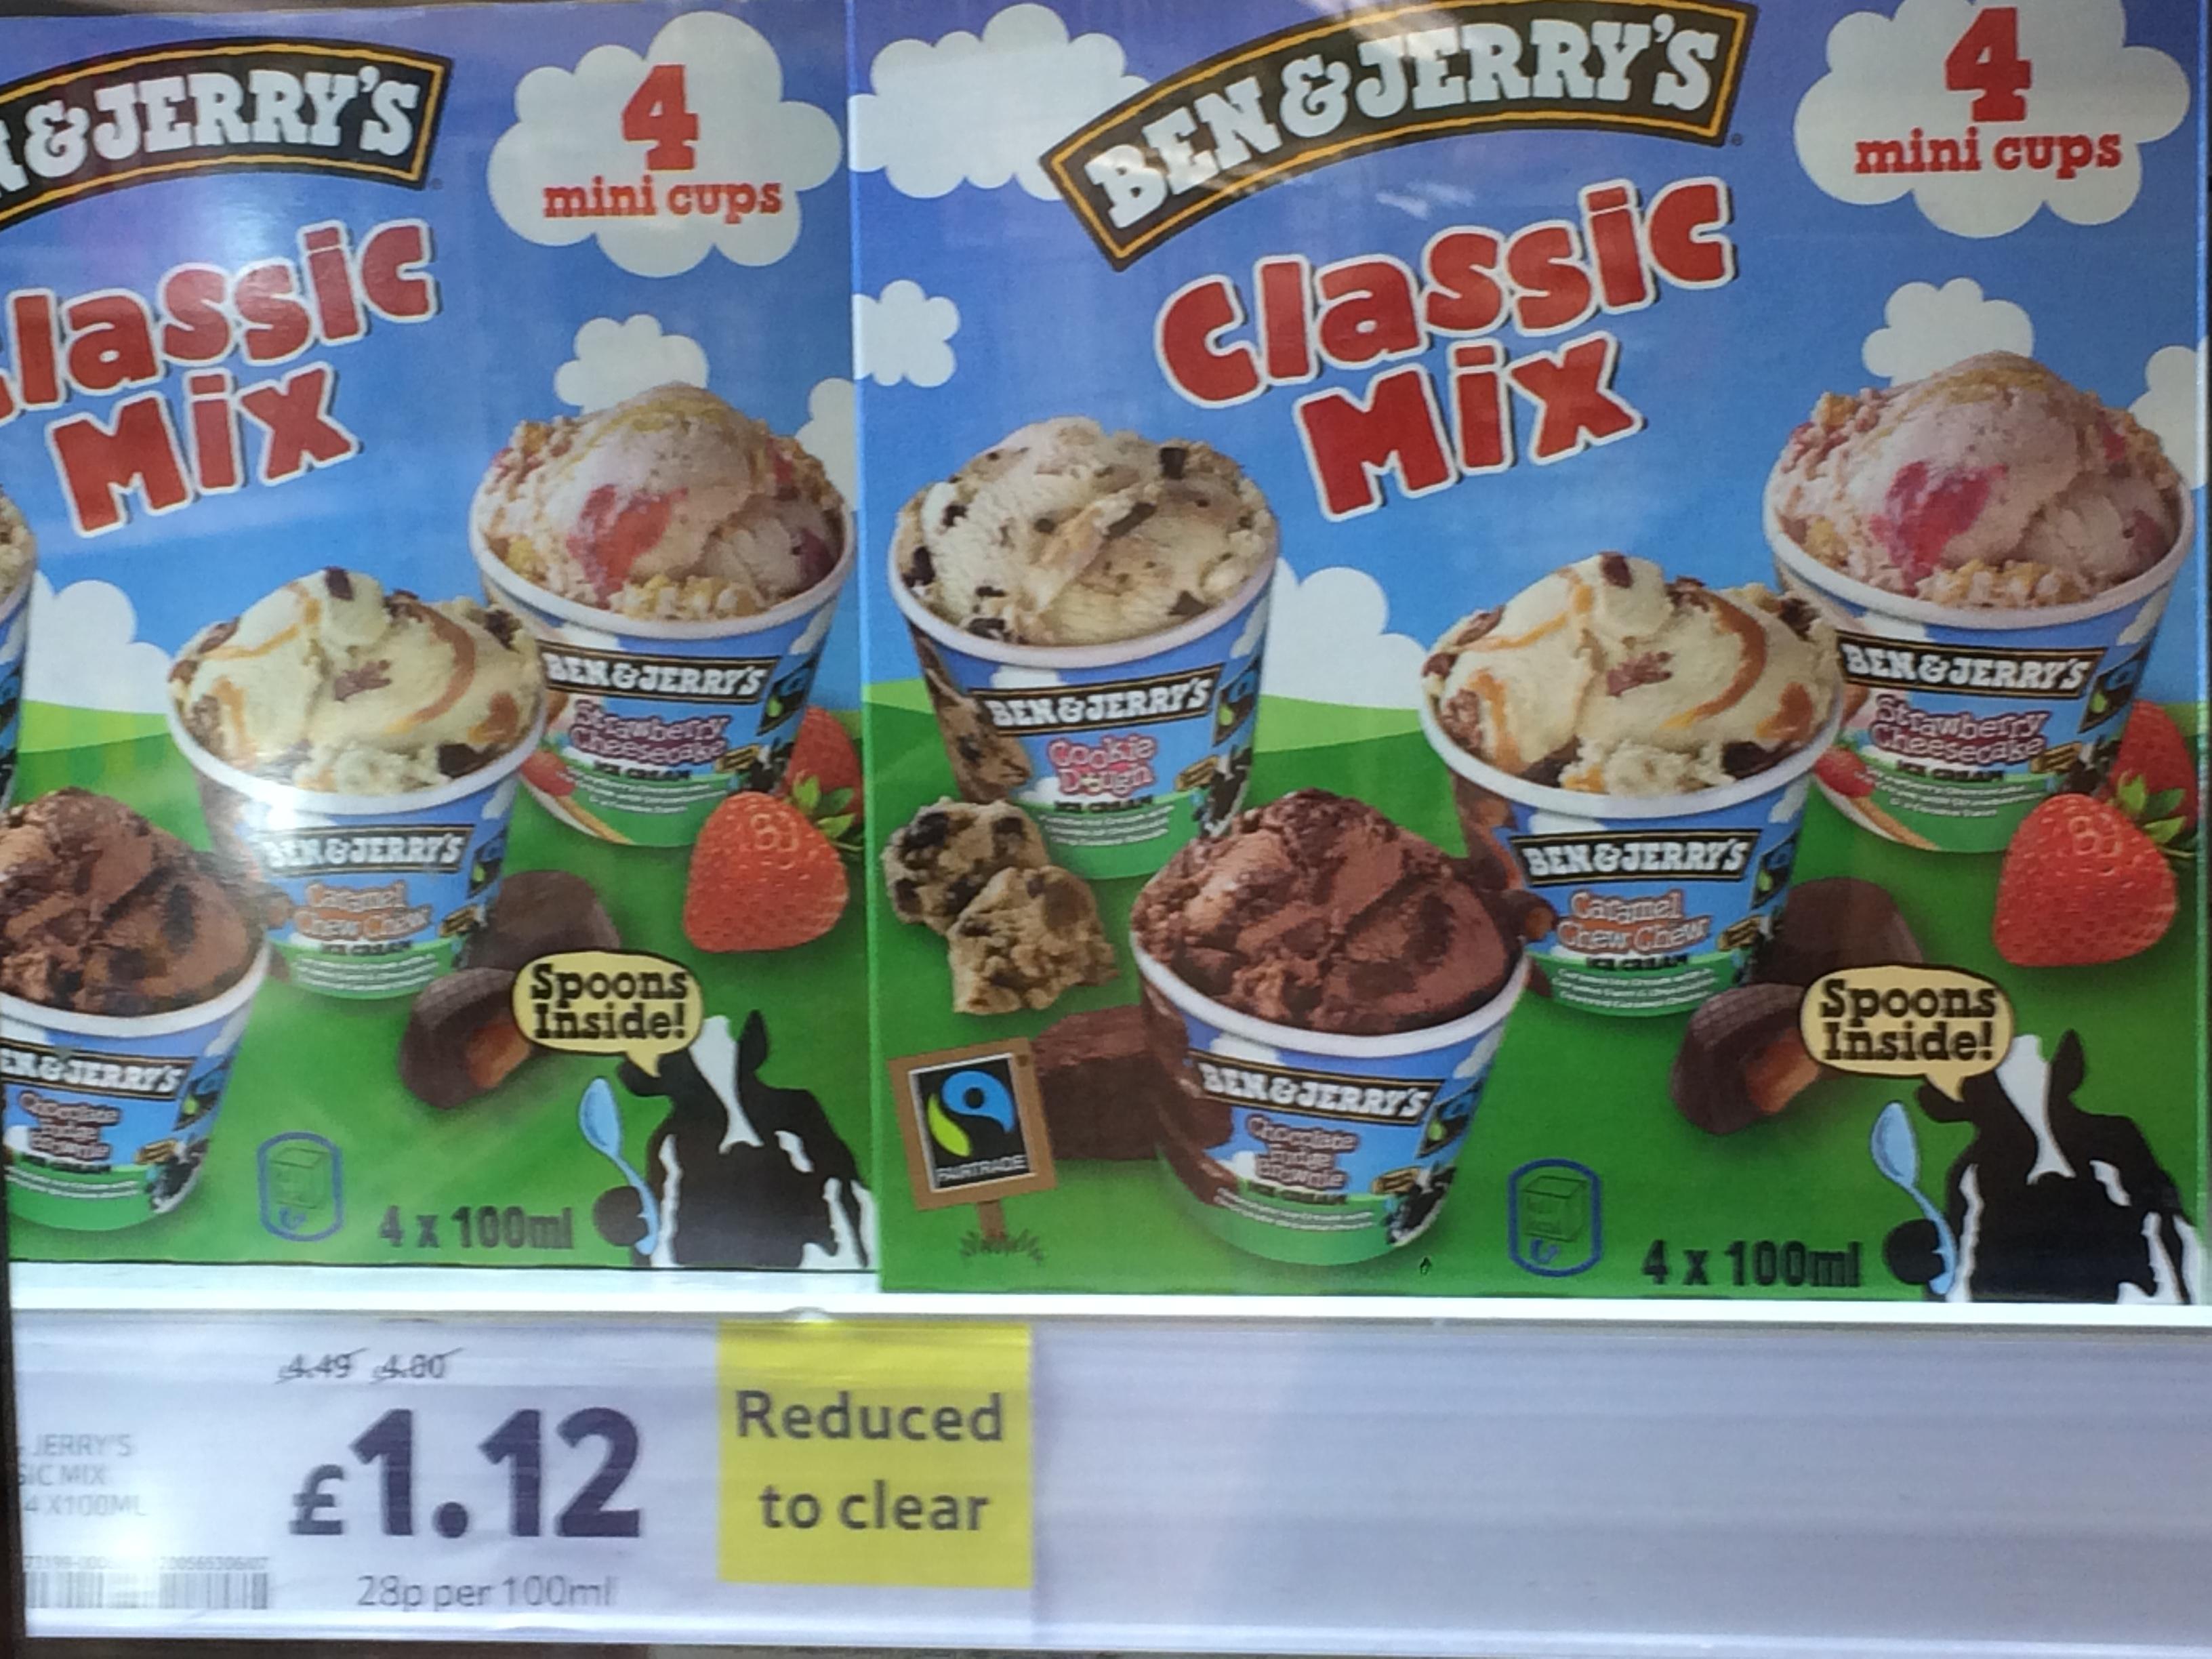 Ben & Jerry's Classic Mix 4 Mini Cups £1.12 @ Tesco Metro store Kirkcudbright